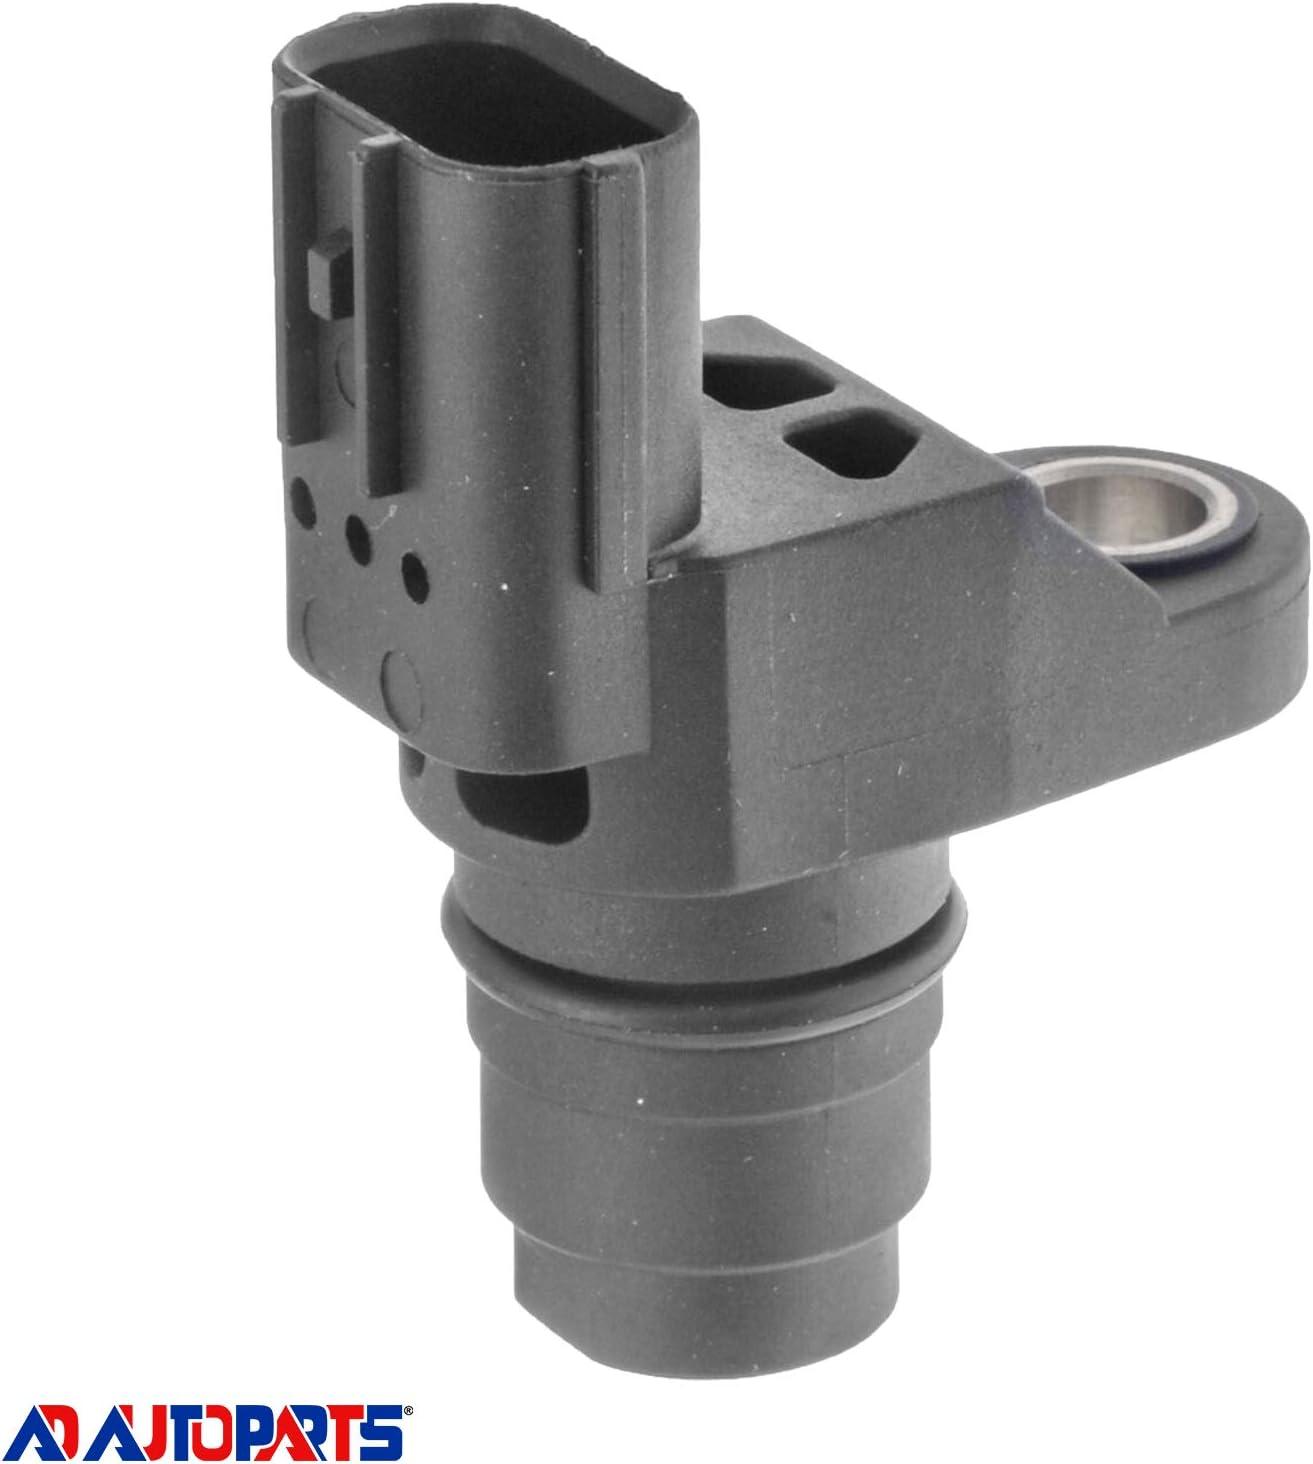 AD Auto Parts Camshaft Position Sensor CMP3088 For Acura Honda 2002-2012